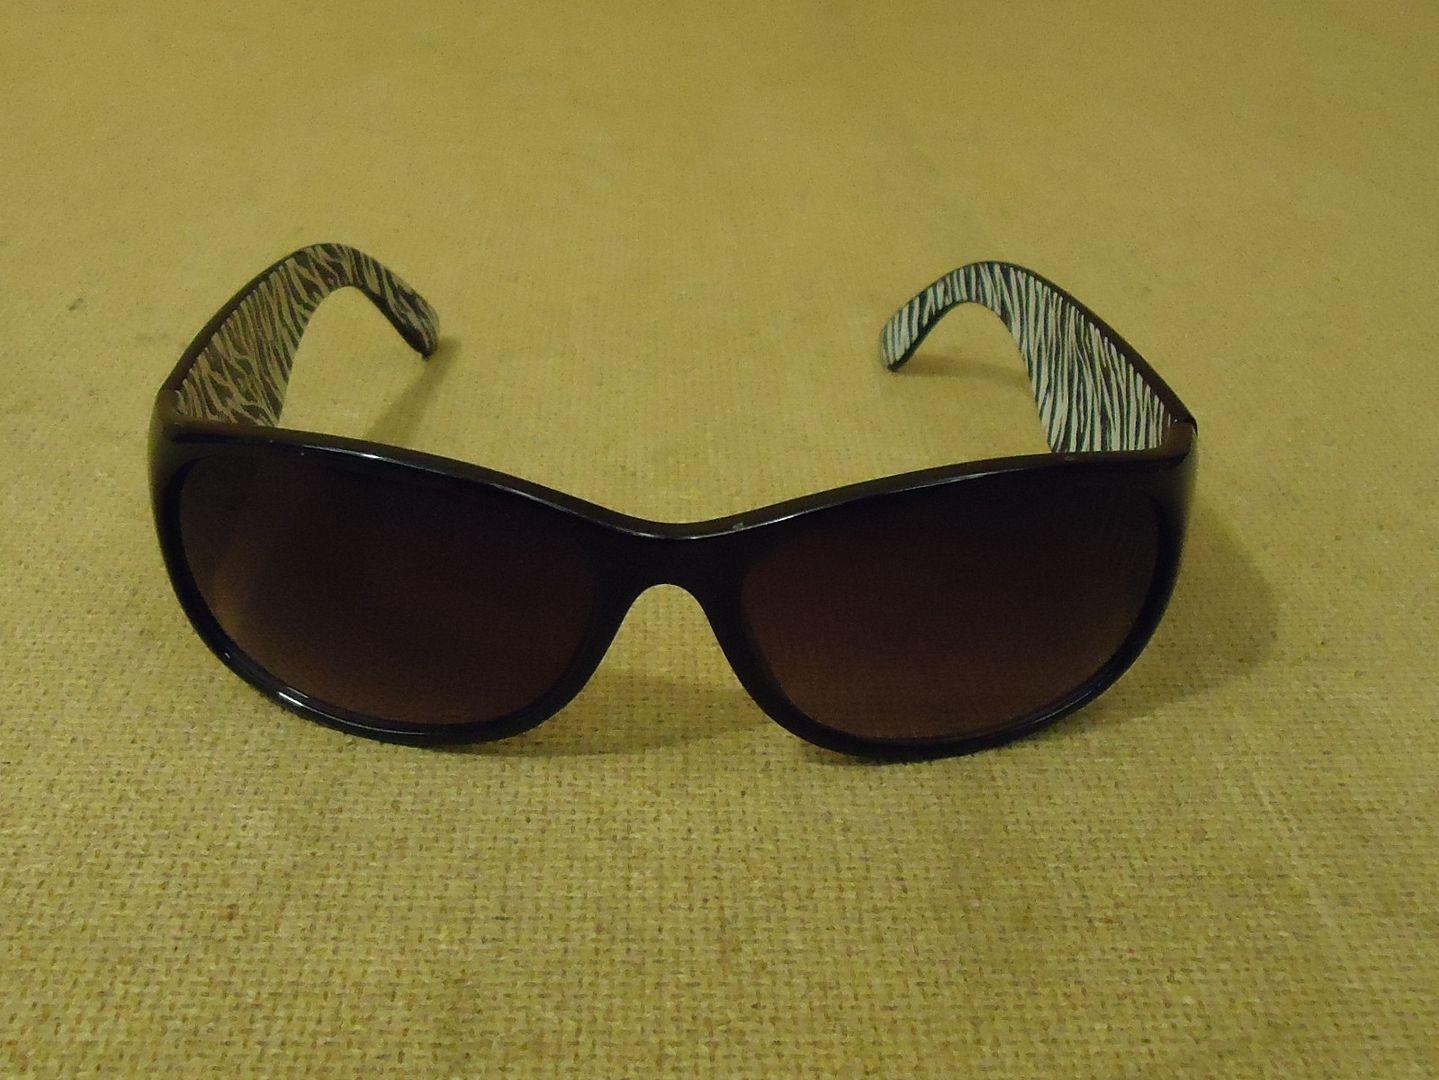 lm7410 112612-262n Designer Sunglasses Rectangular Female Adult Blacks Animal Print